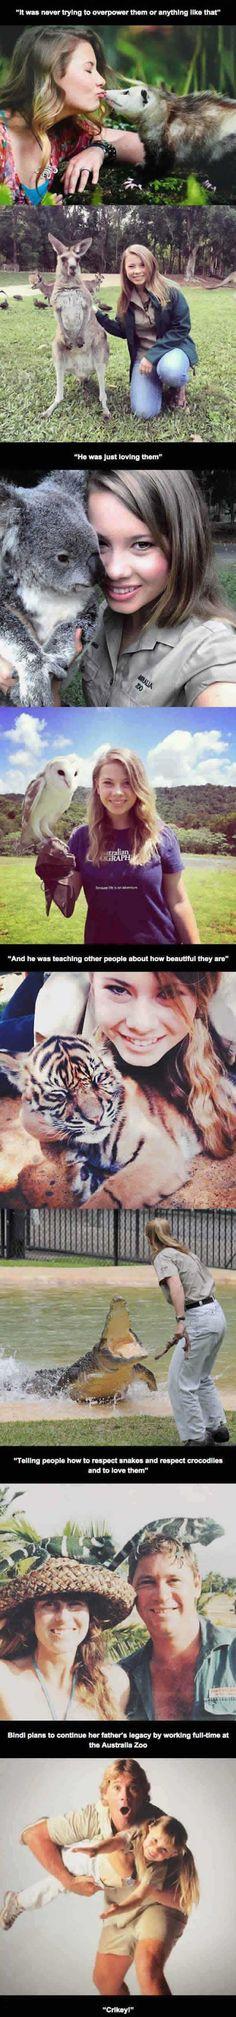 "Meet Bindi- Steve Irwin's daughter ""The Crocodile Hunter"""